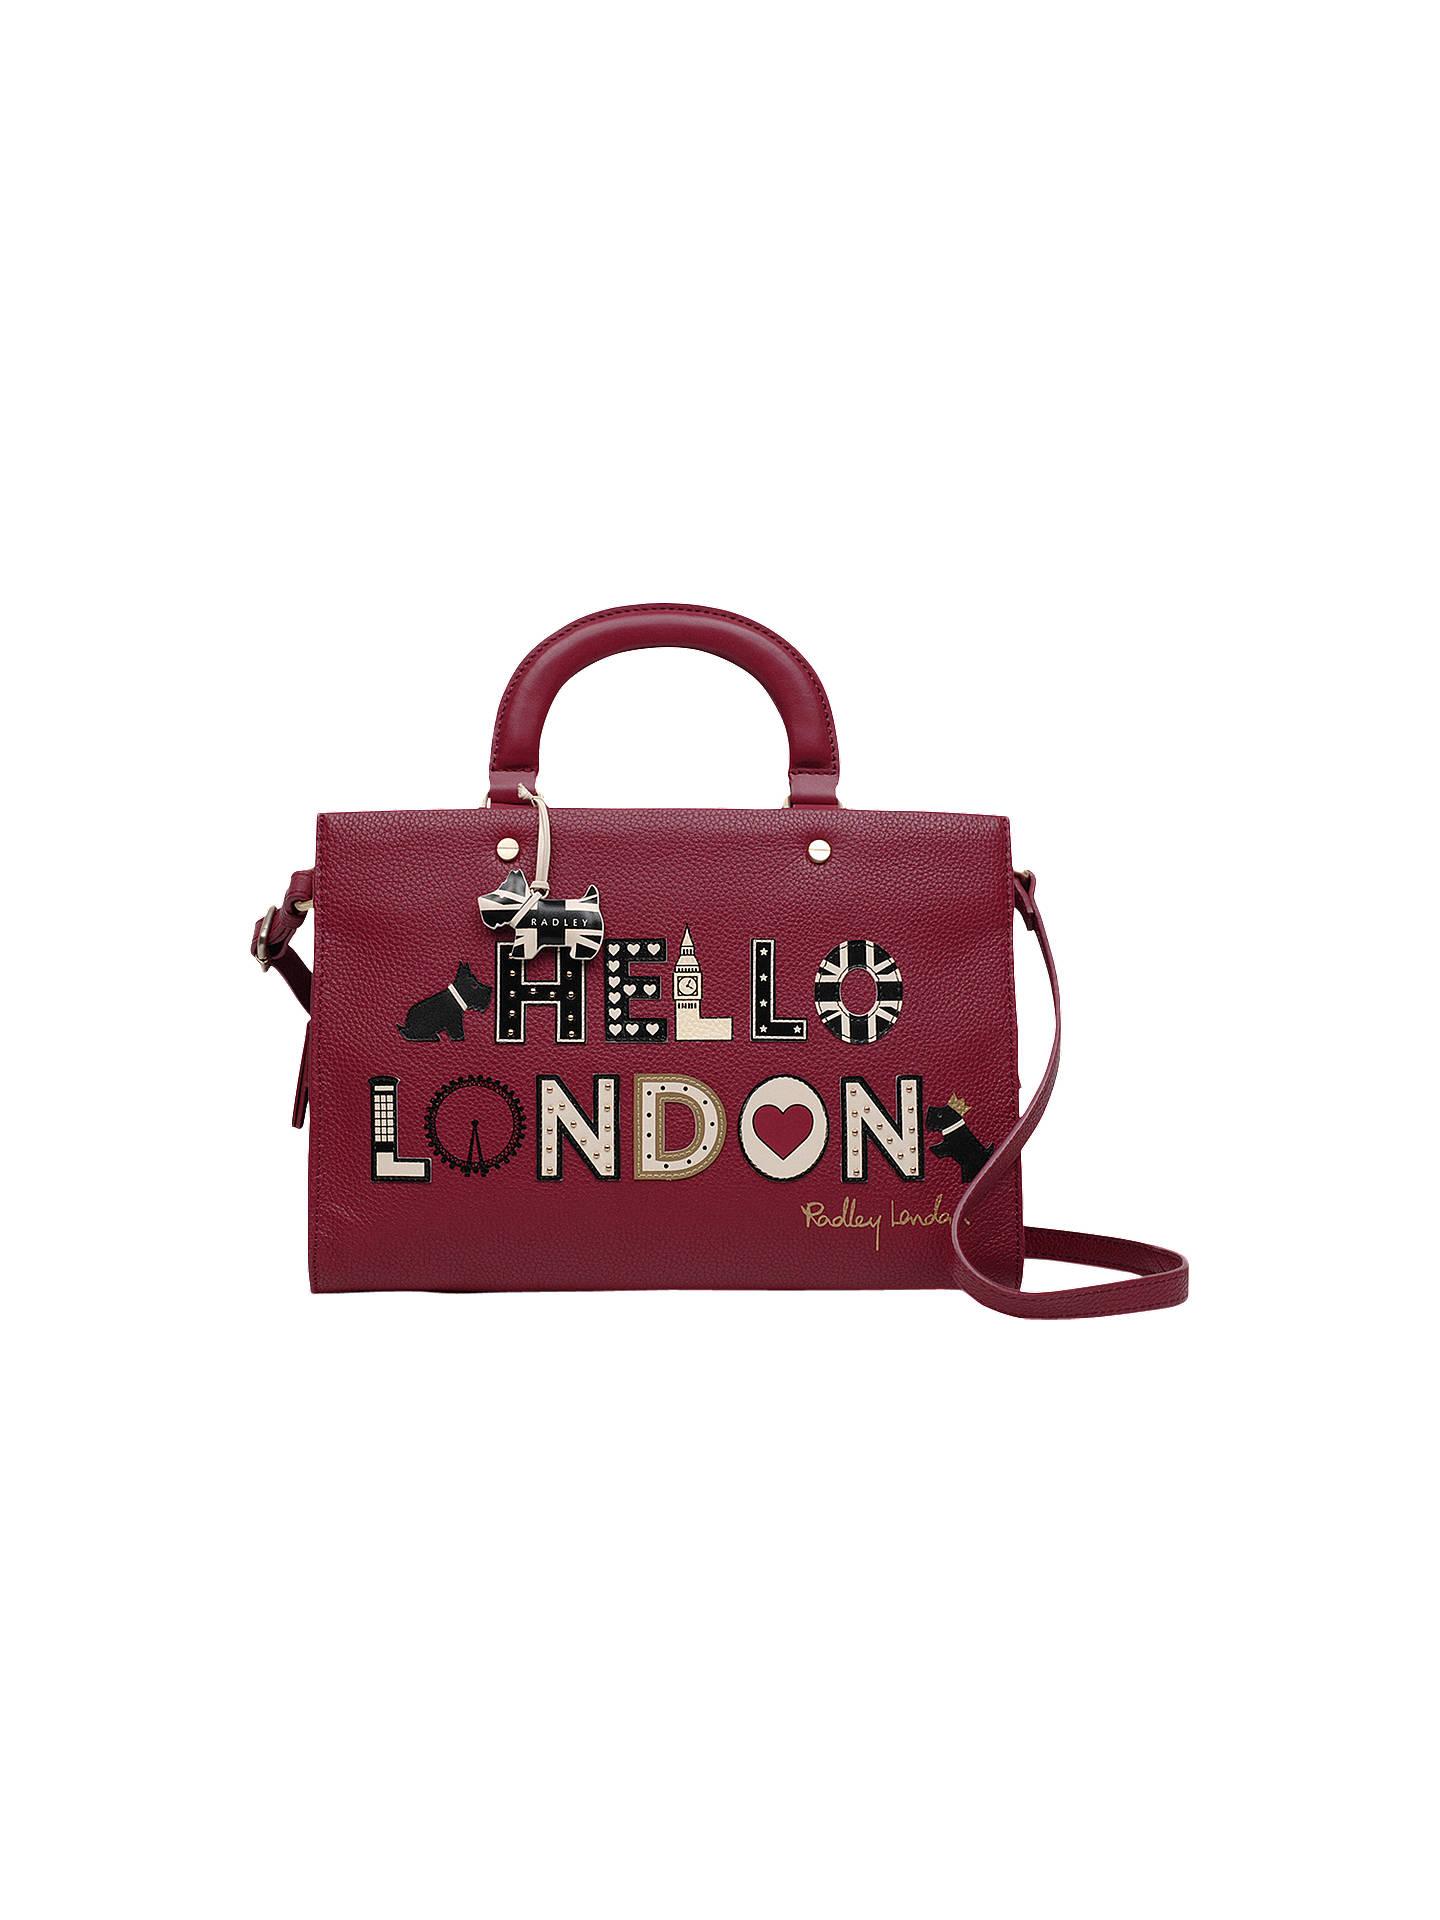 Radley Royal Wedding London S Calling Medium Leather Grab Bag Claret Red Online At Johnlewis